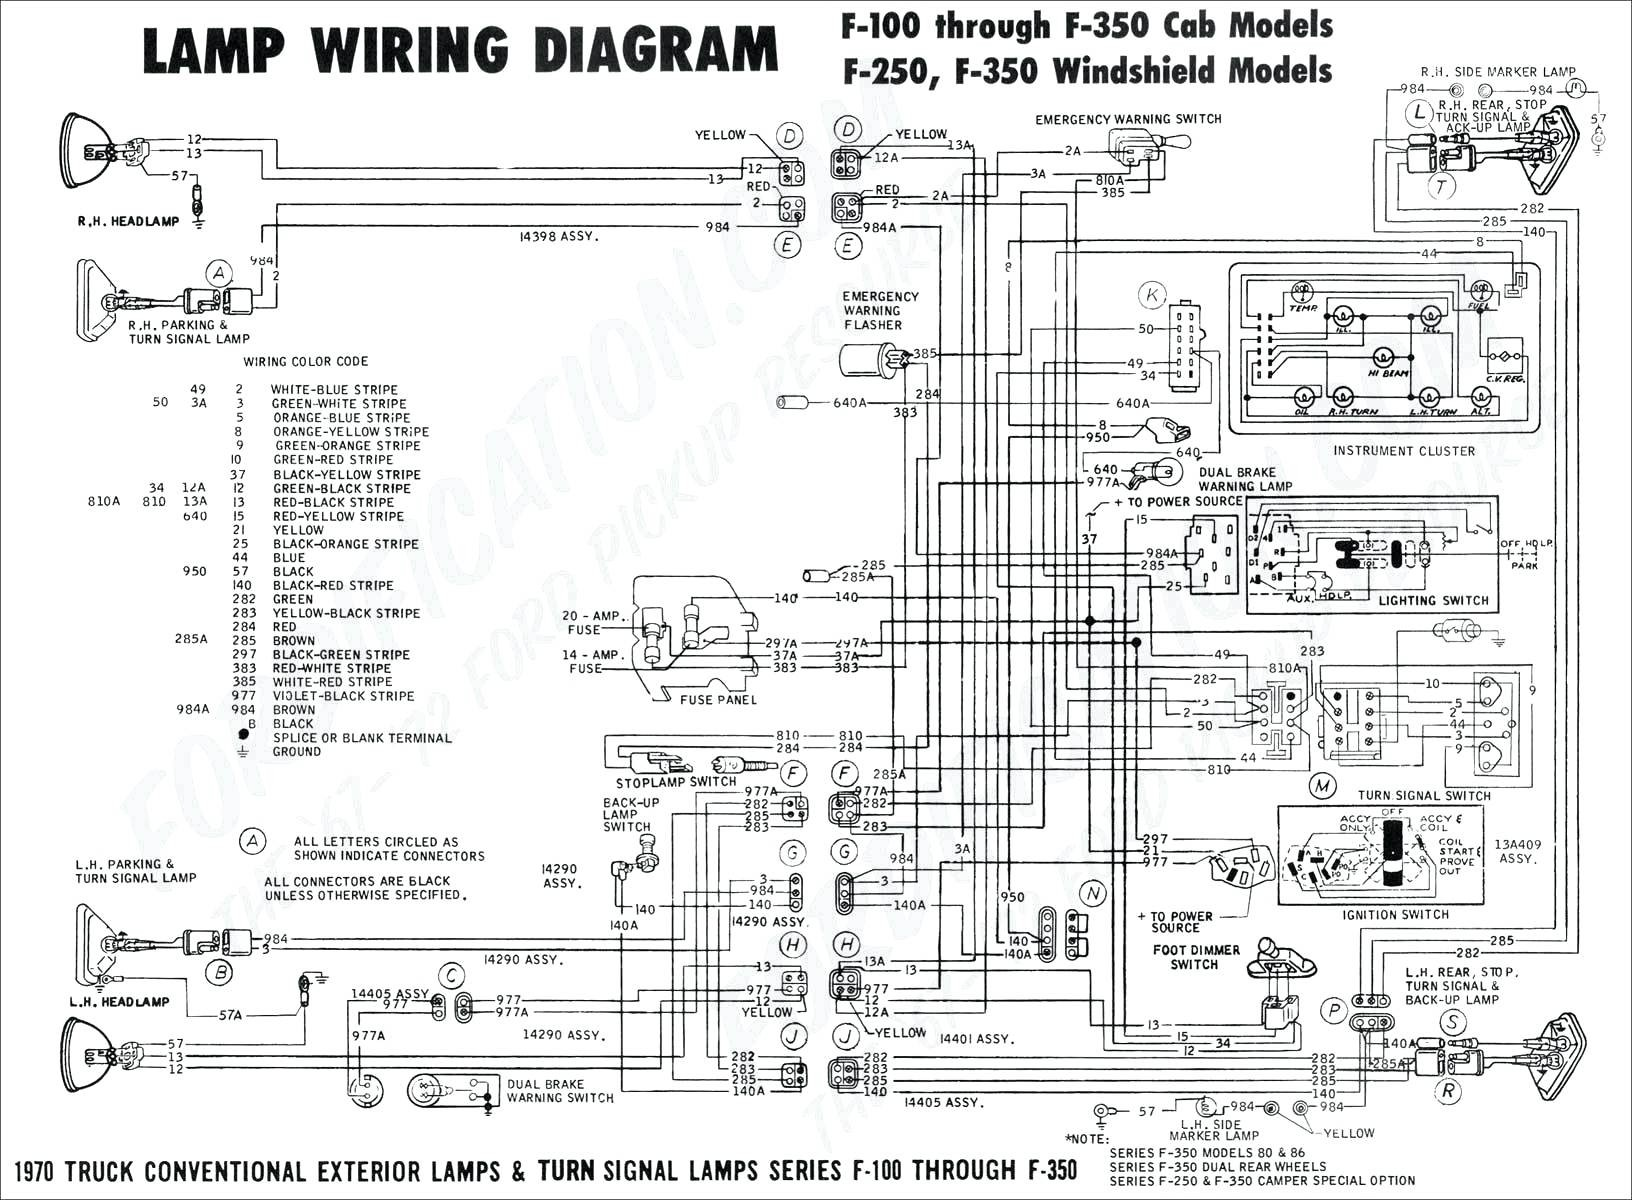 68 Camaro Engine Wiring Diagram 2000 Camaro Headlight Wiring Diagram Wire Center • Of 68 Camaro Engine Wiring Diagram